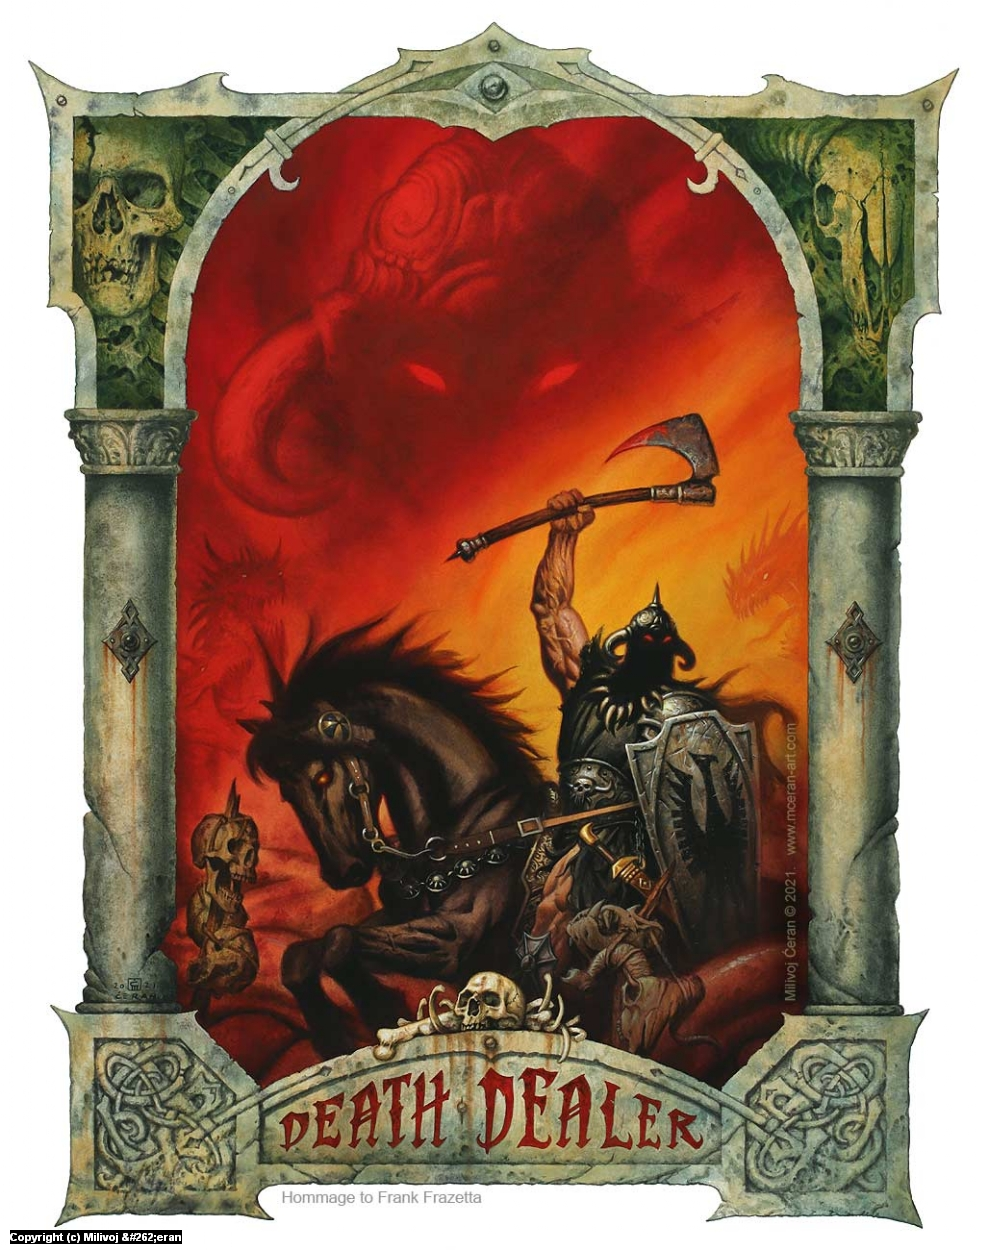 Death Dealer Artwork by Milivoj Ceran